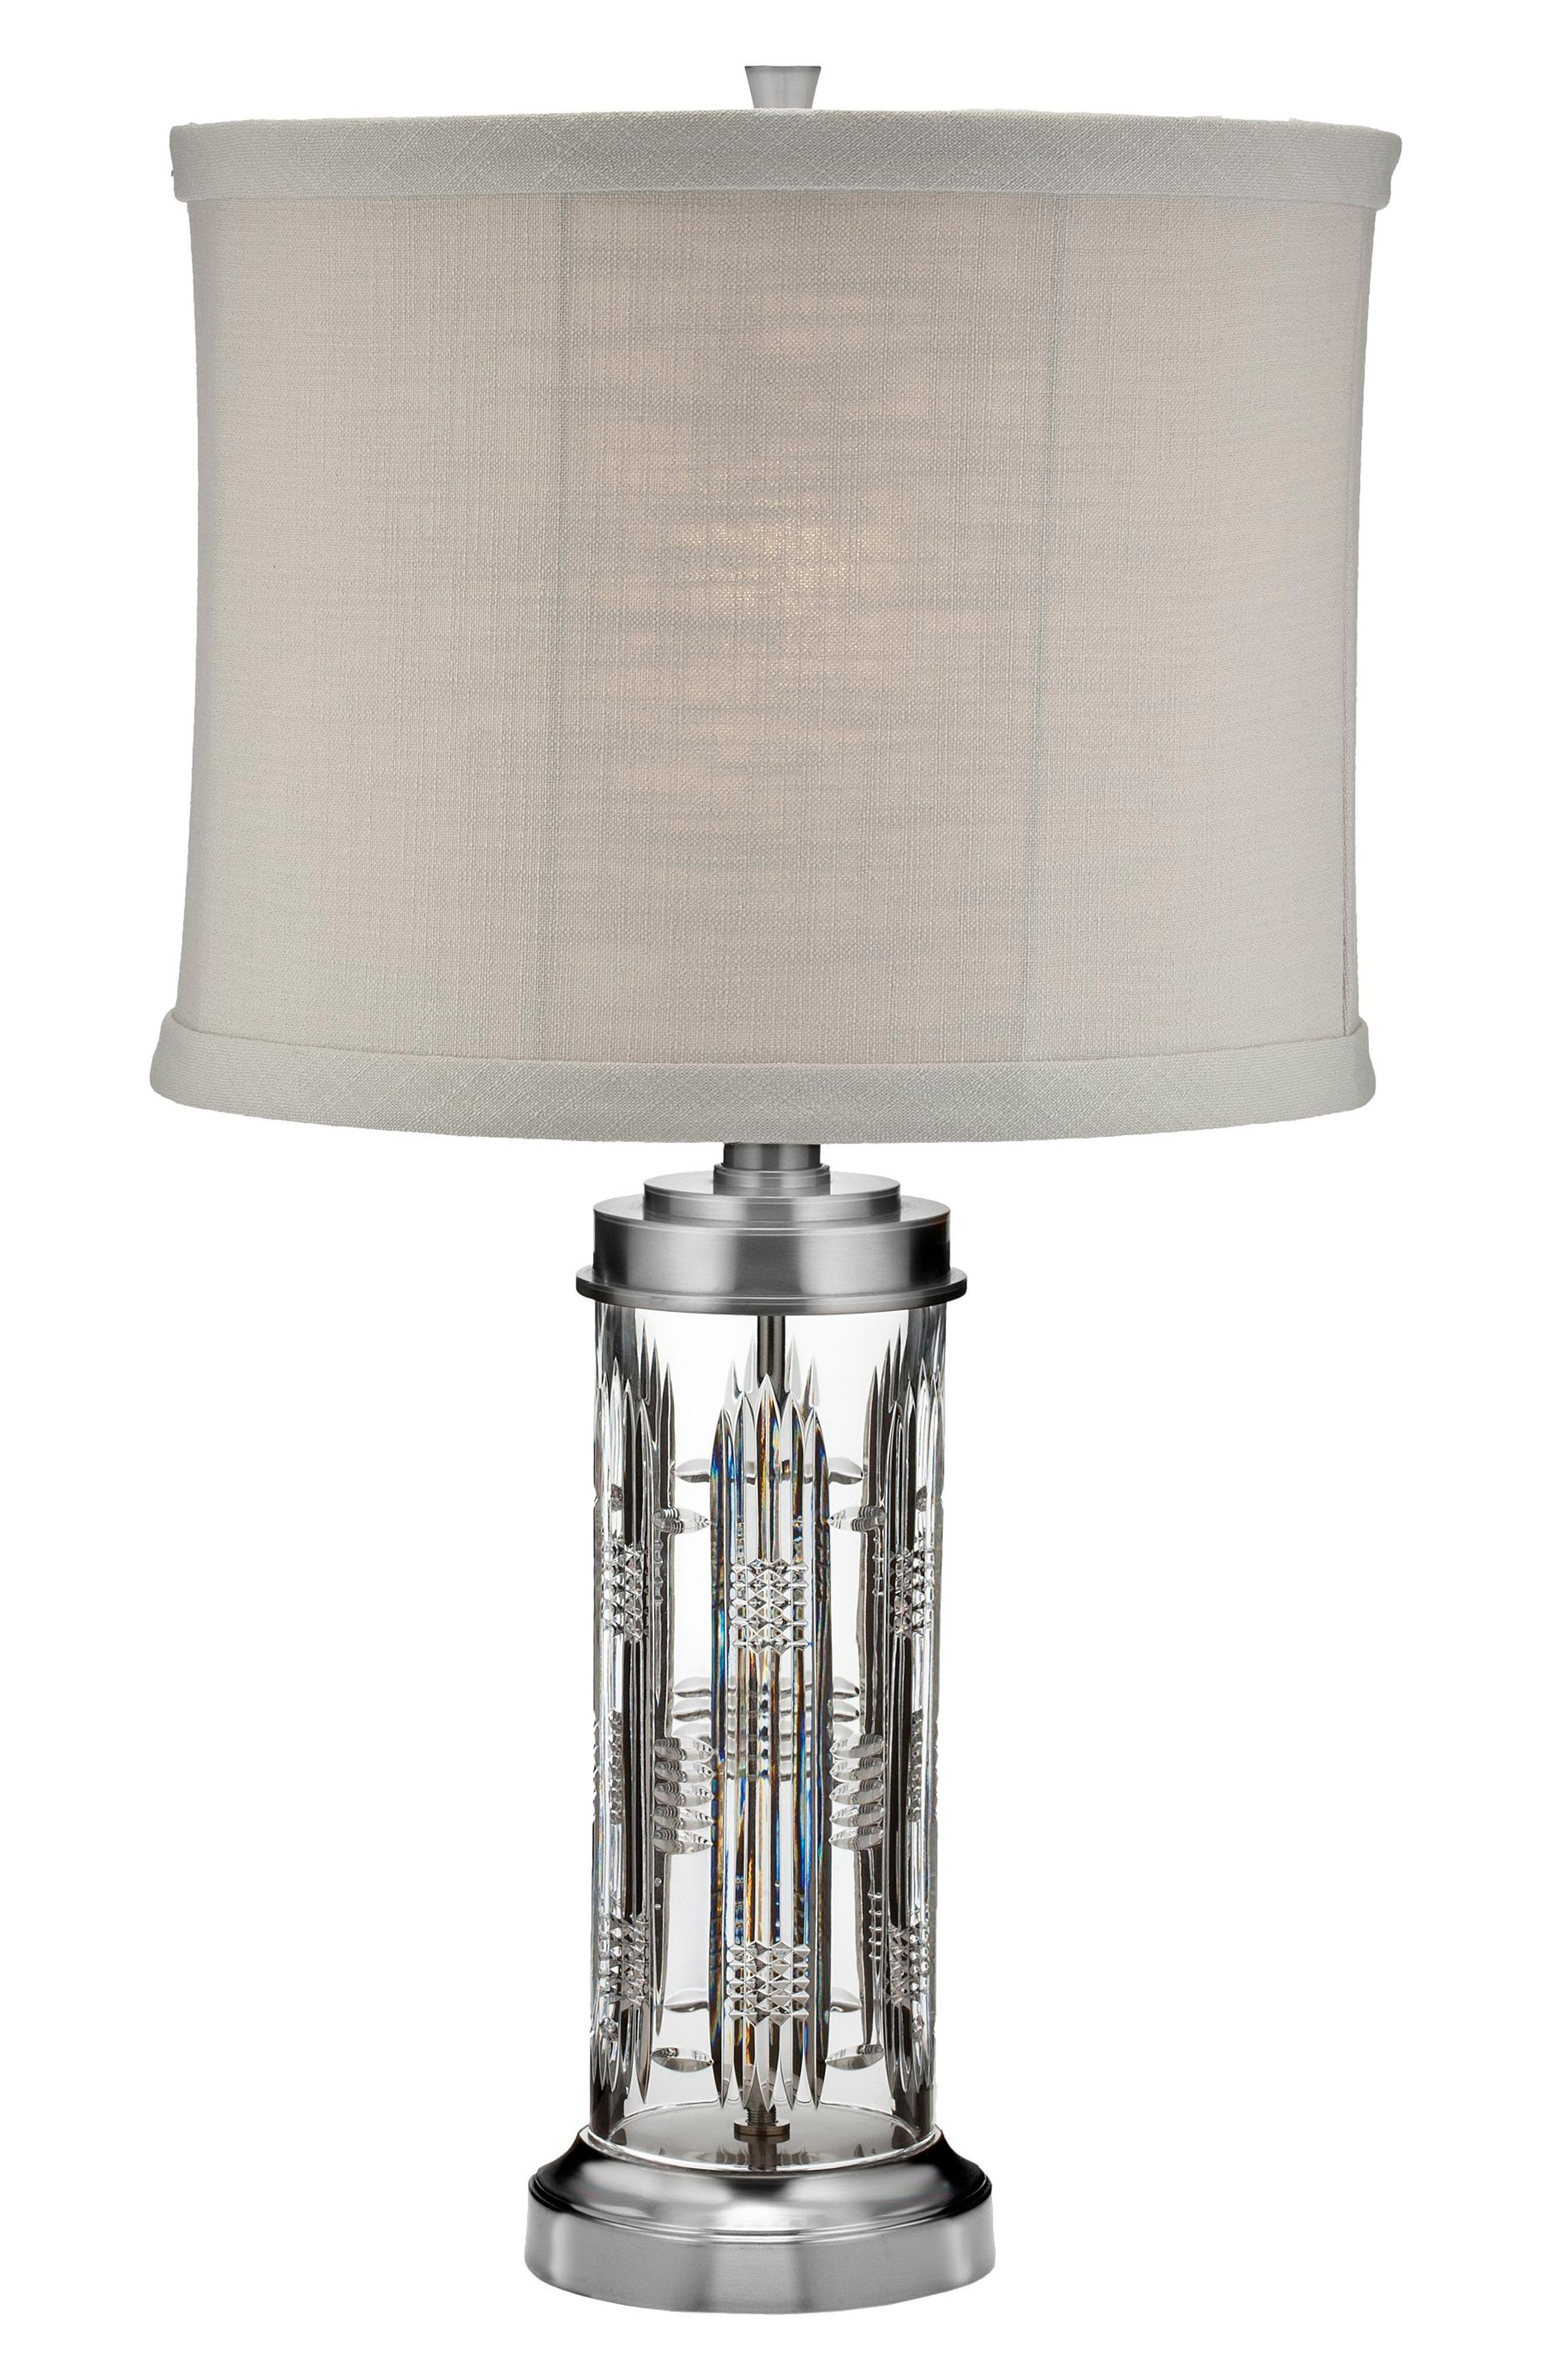 Dungarvan Lead Crystal Chrome Table Lamp,                             Main thumbnail 1, color,                             100